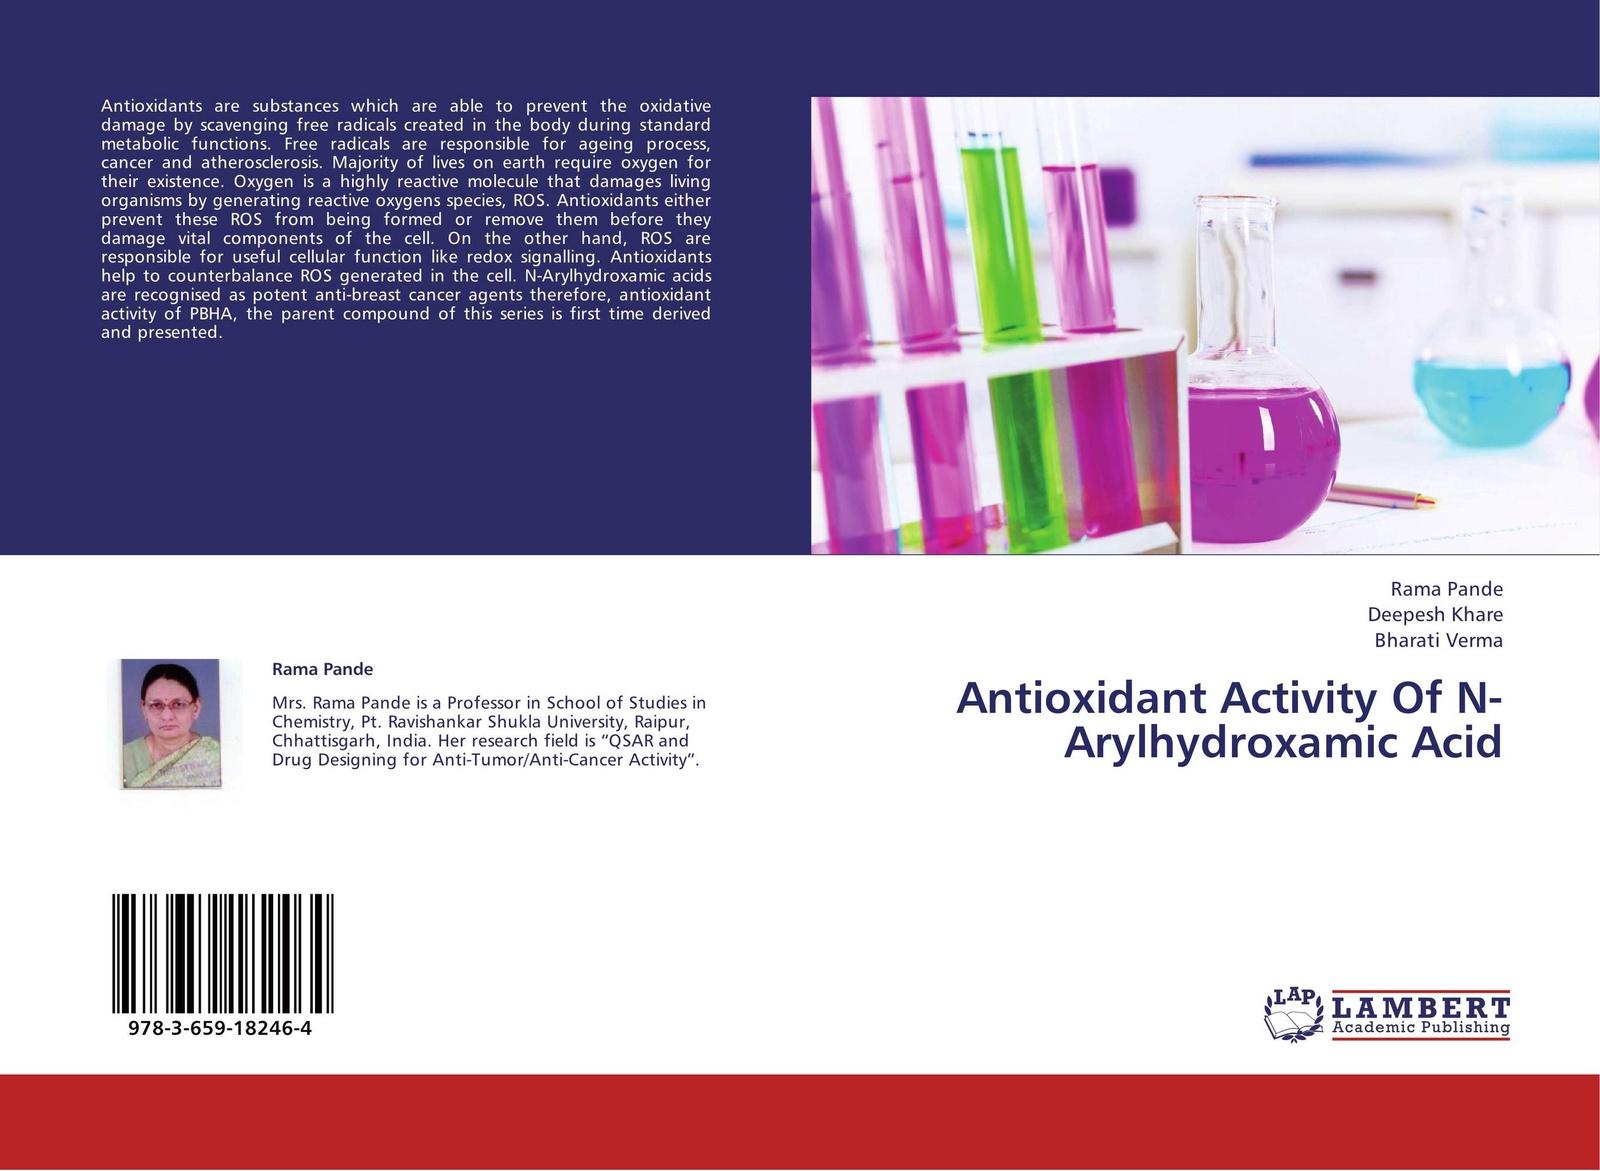 Rama Pande,Deepesh Khare and Bharati Verma Antioxidant Activity Of N-Arylhydroxamic Acid недорго, оригинальная цена